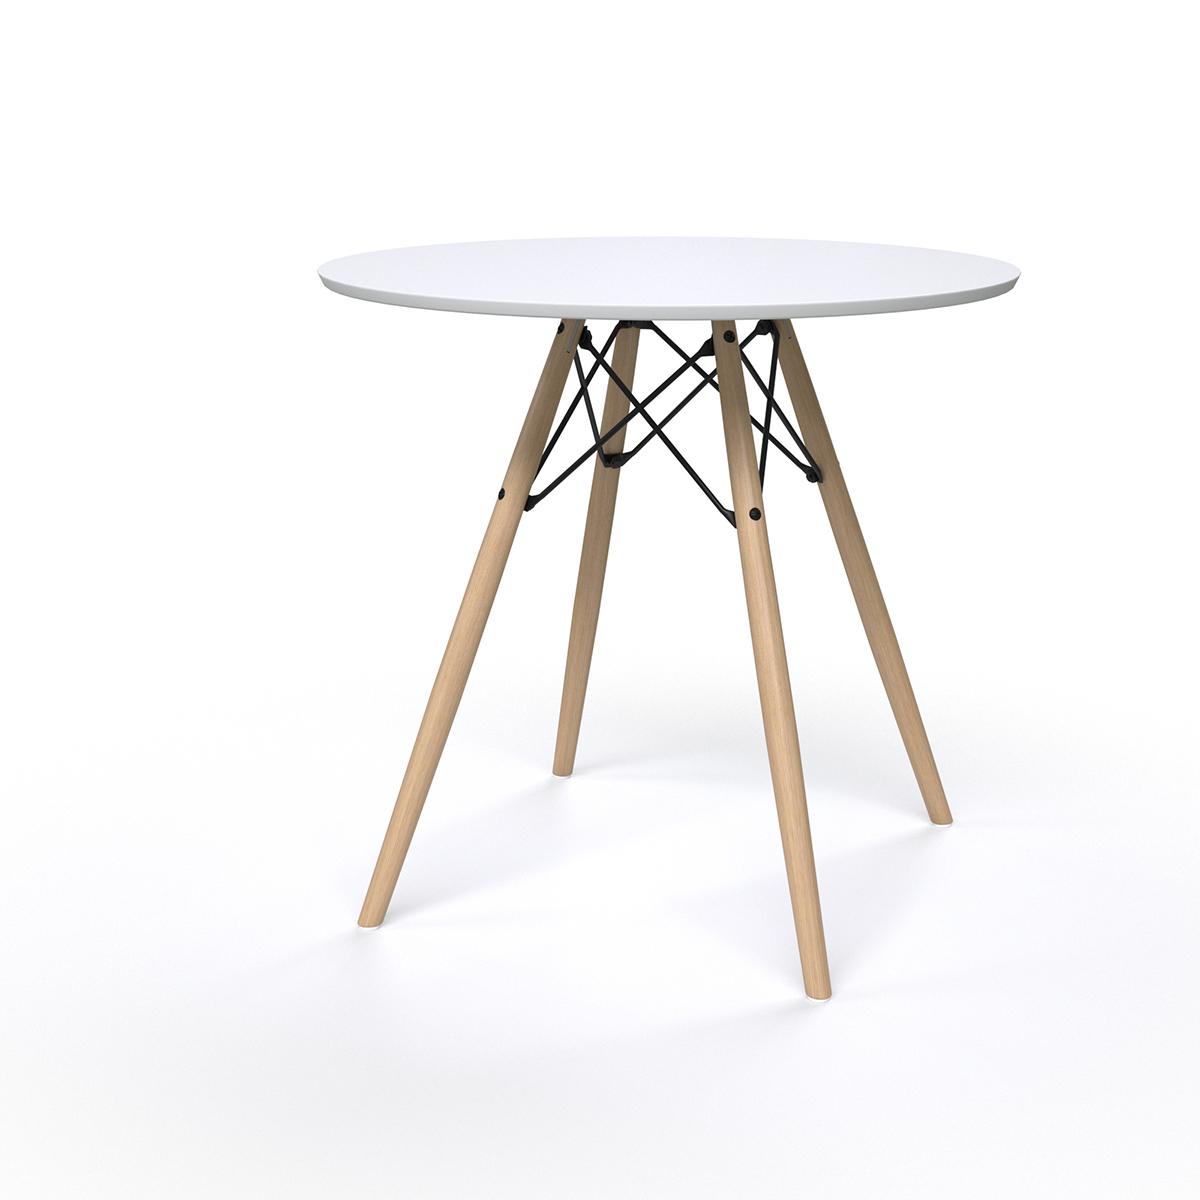 TABLE SCANDINAVE BLANCHE - Ø7